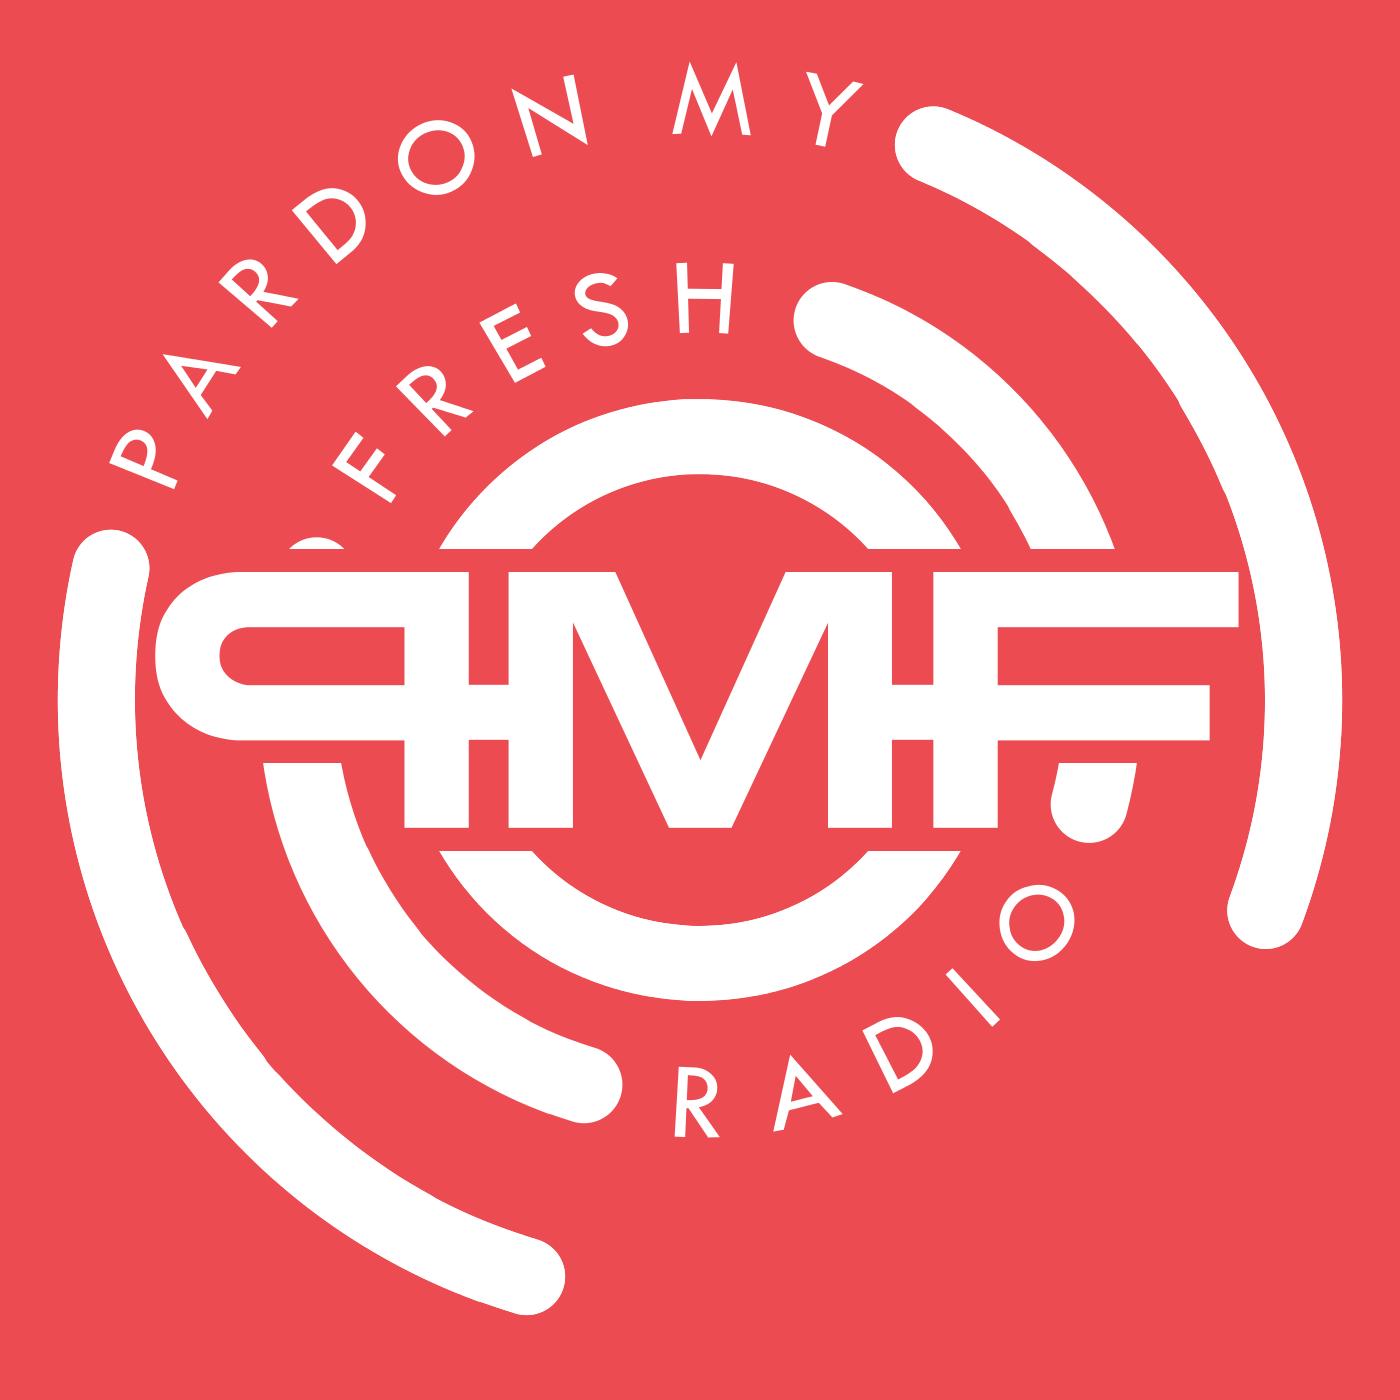 PMF RADIO LOGO (WHT REDBG) [by THE JTPK].png